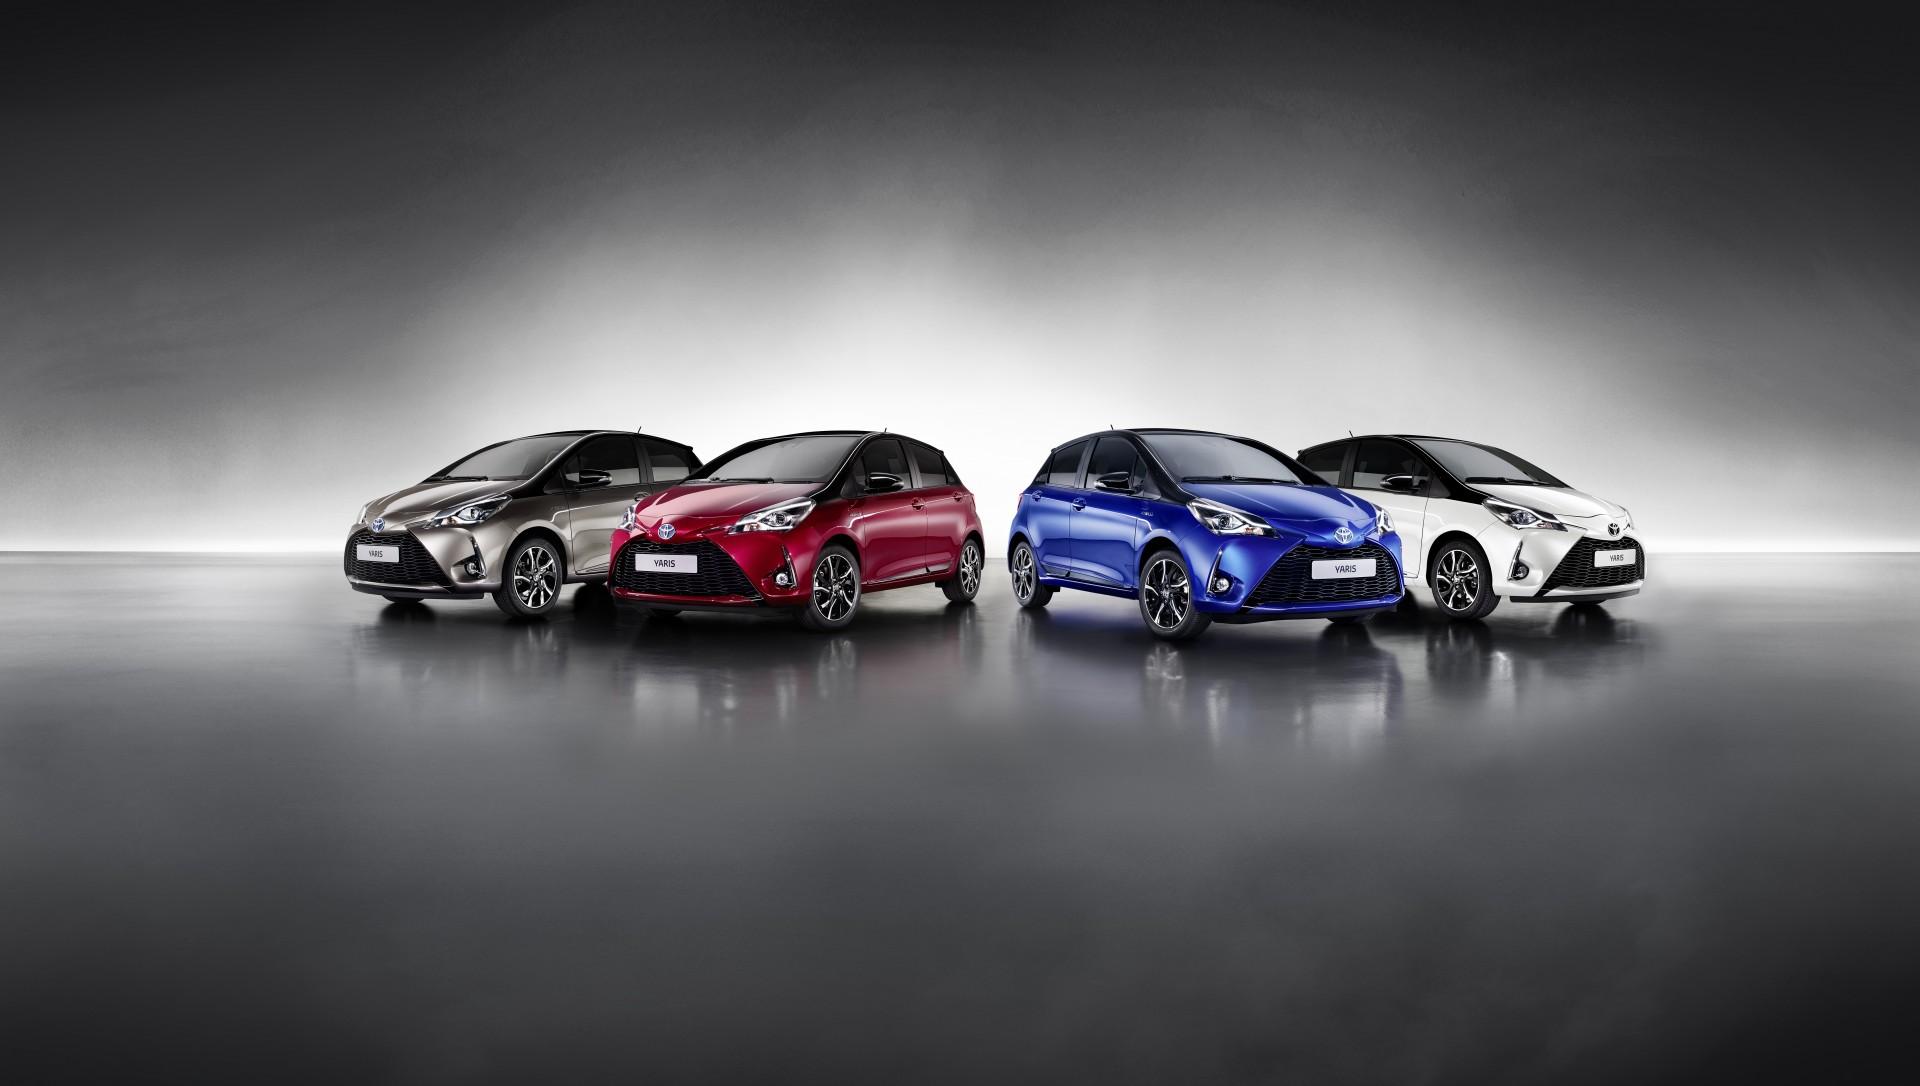 New 2017 Toyota Yaris Led Driven Tail Brake Light Cluster